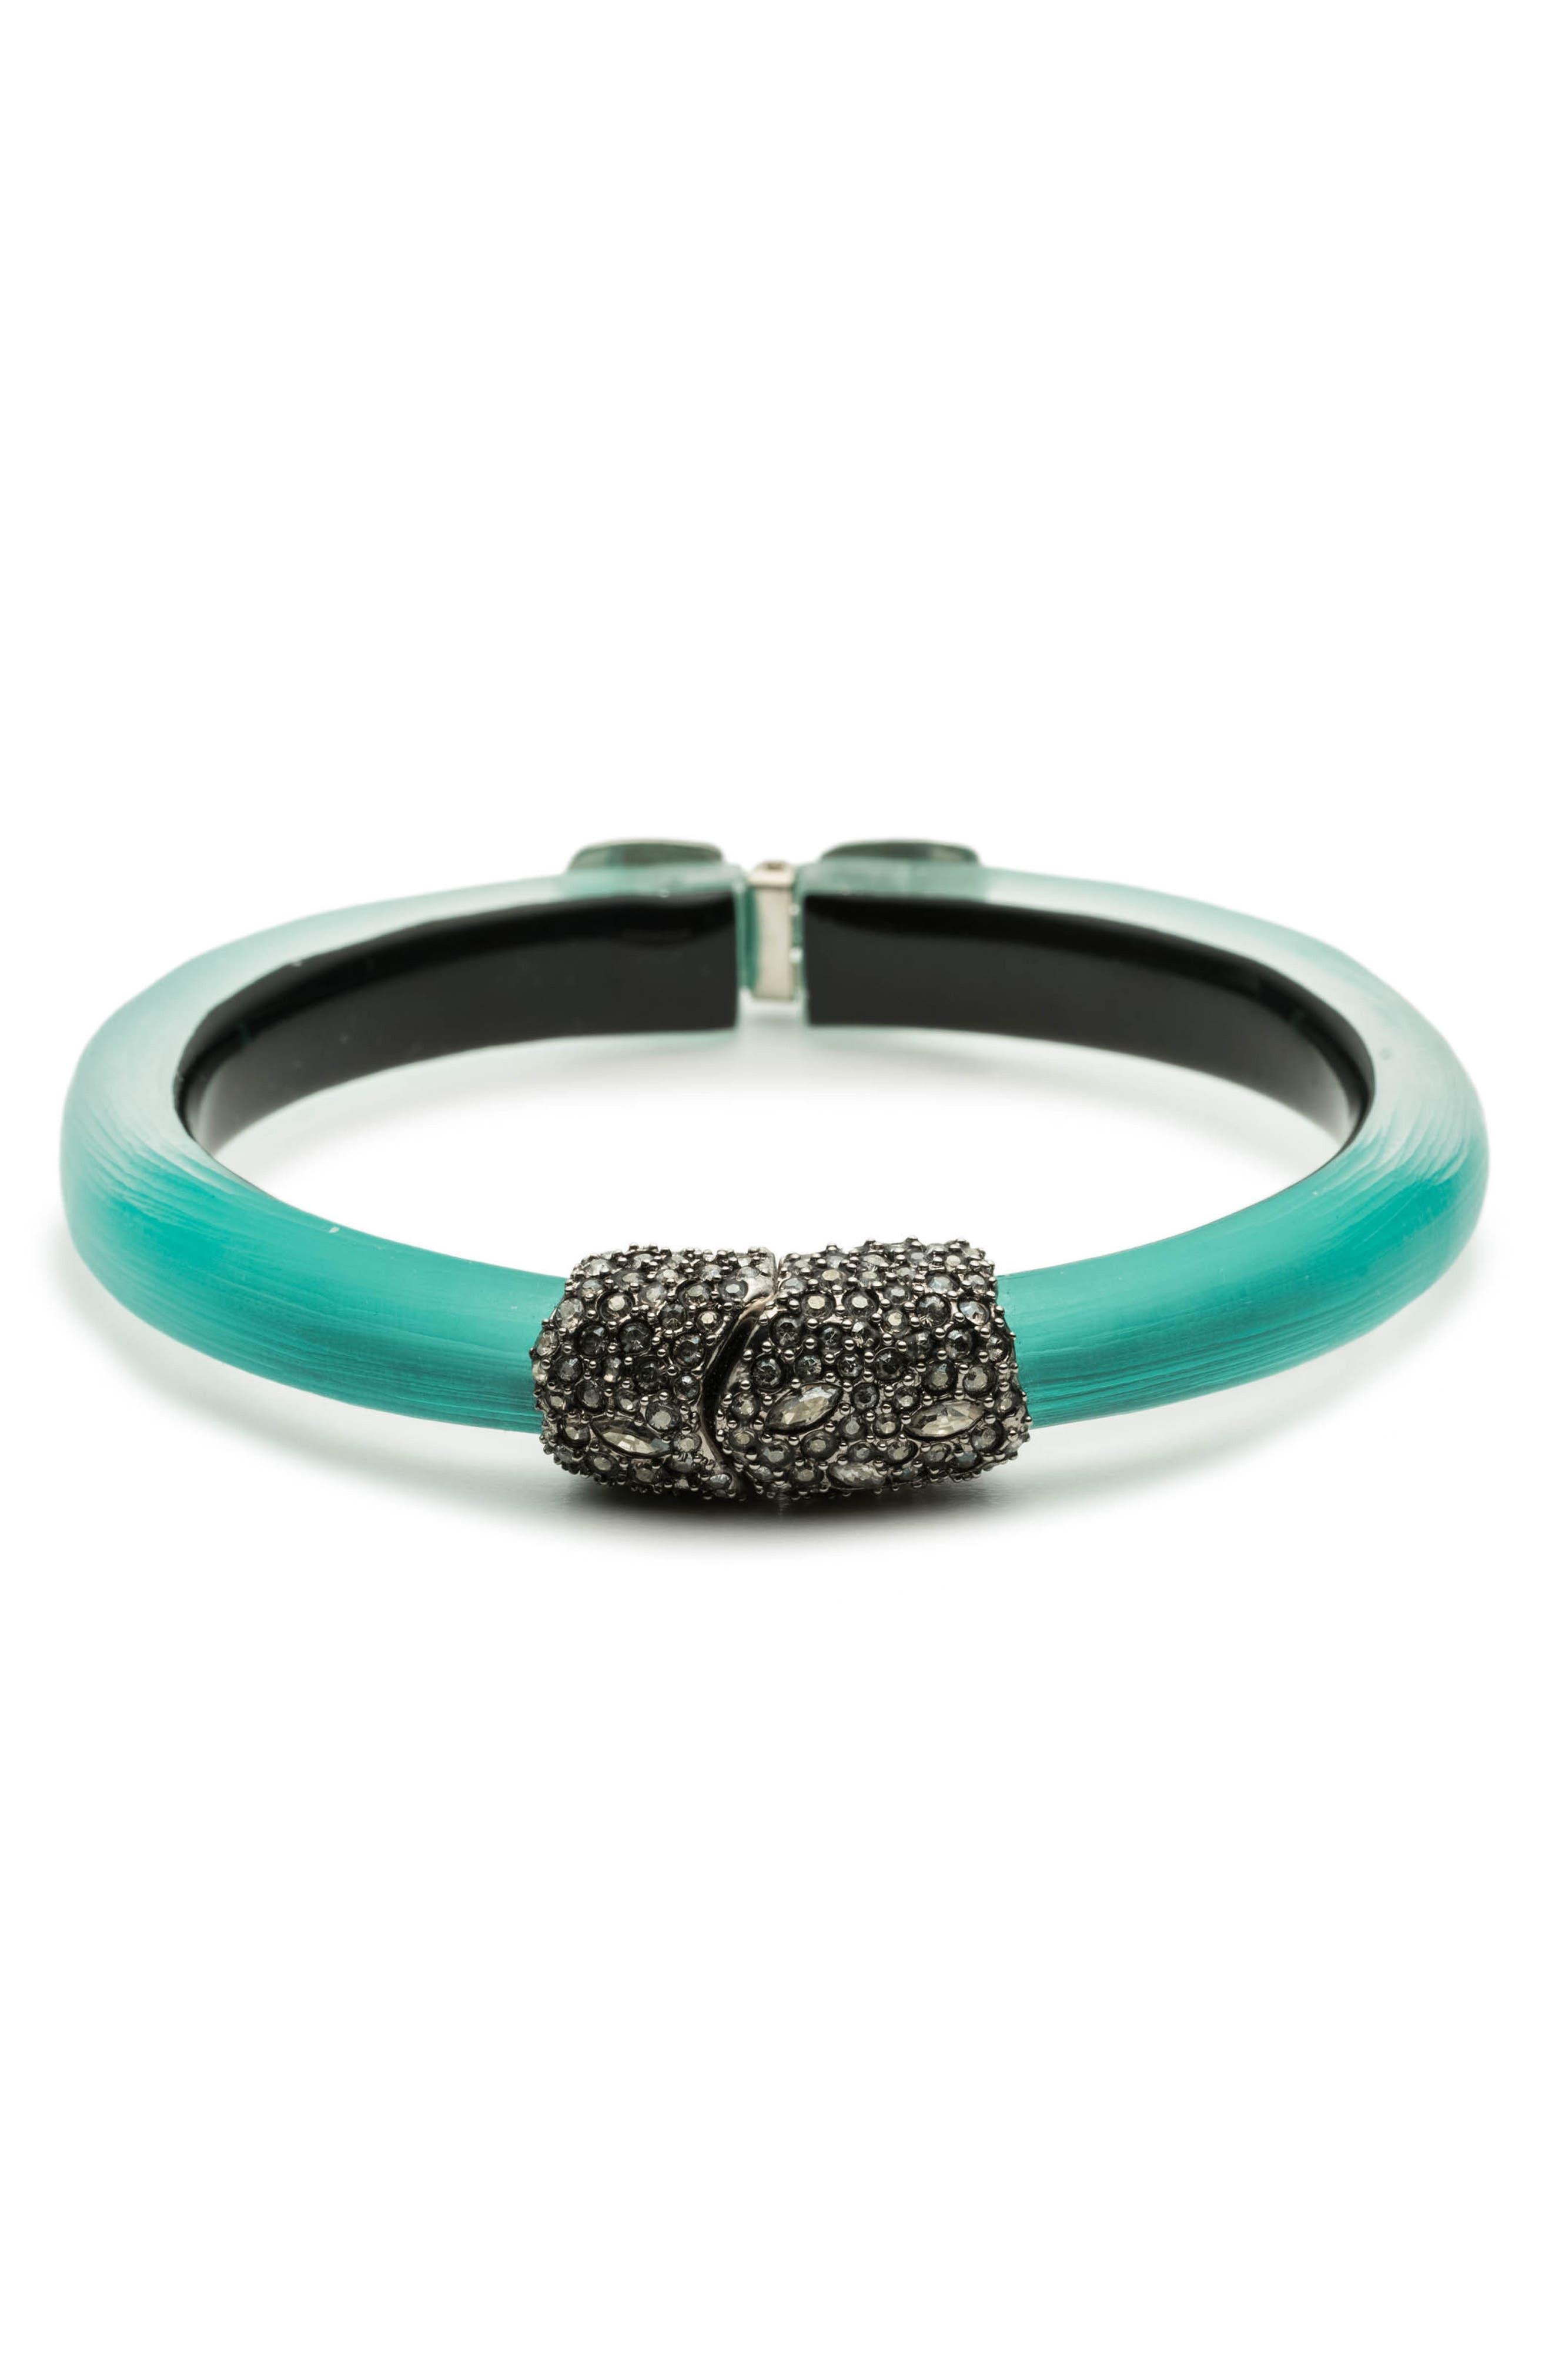 Skinny Hinge Bracelet,                         Main,                         color, Mint Green